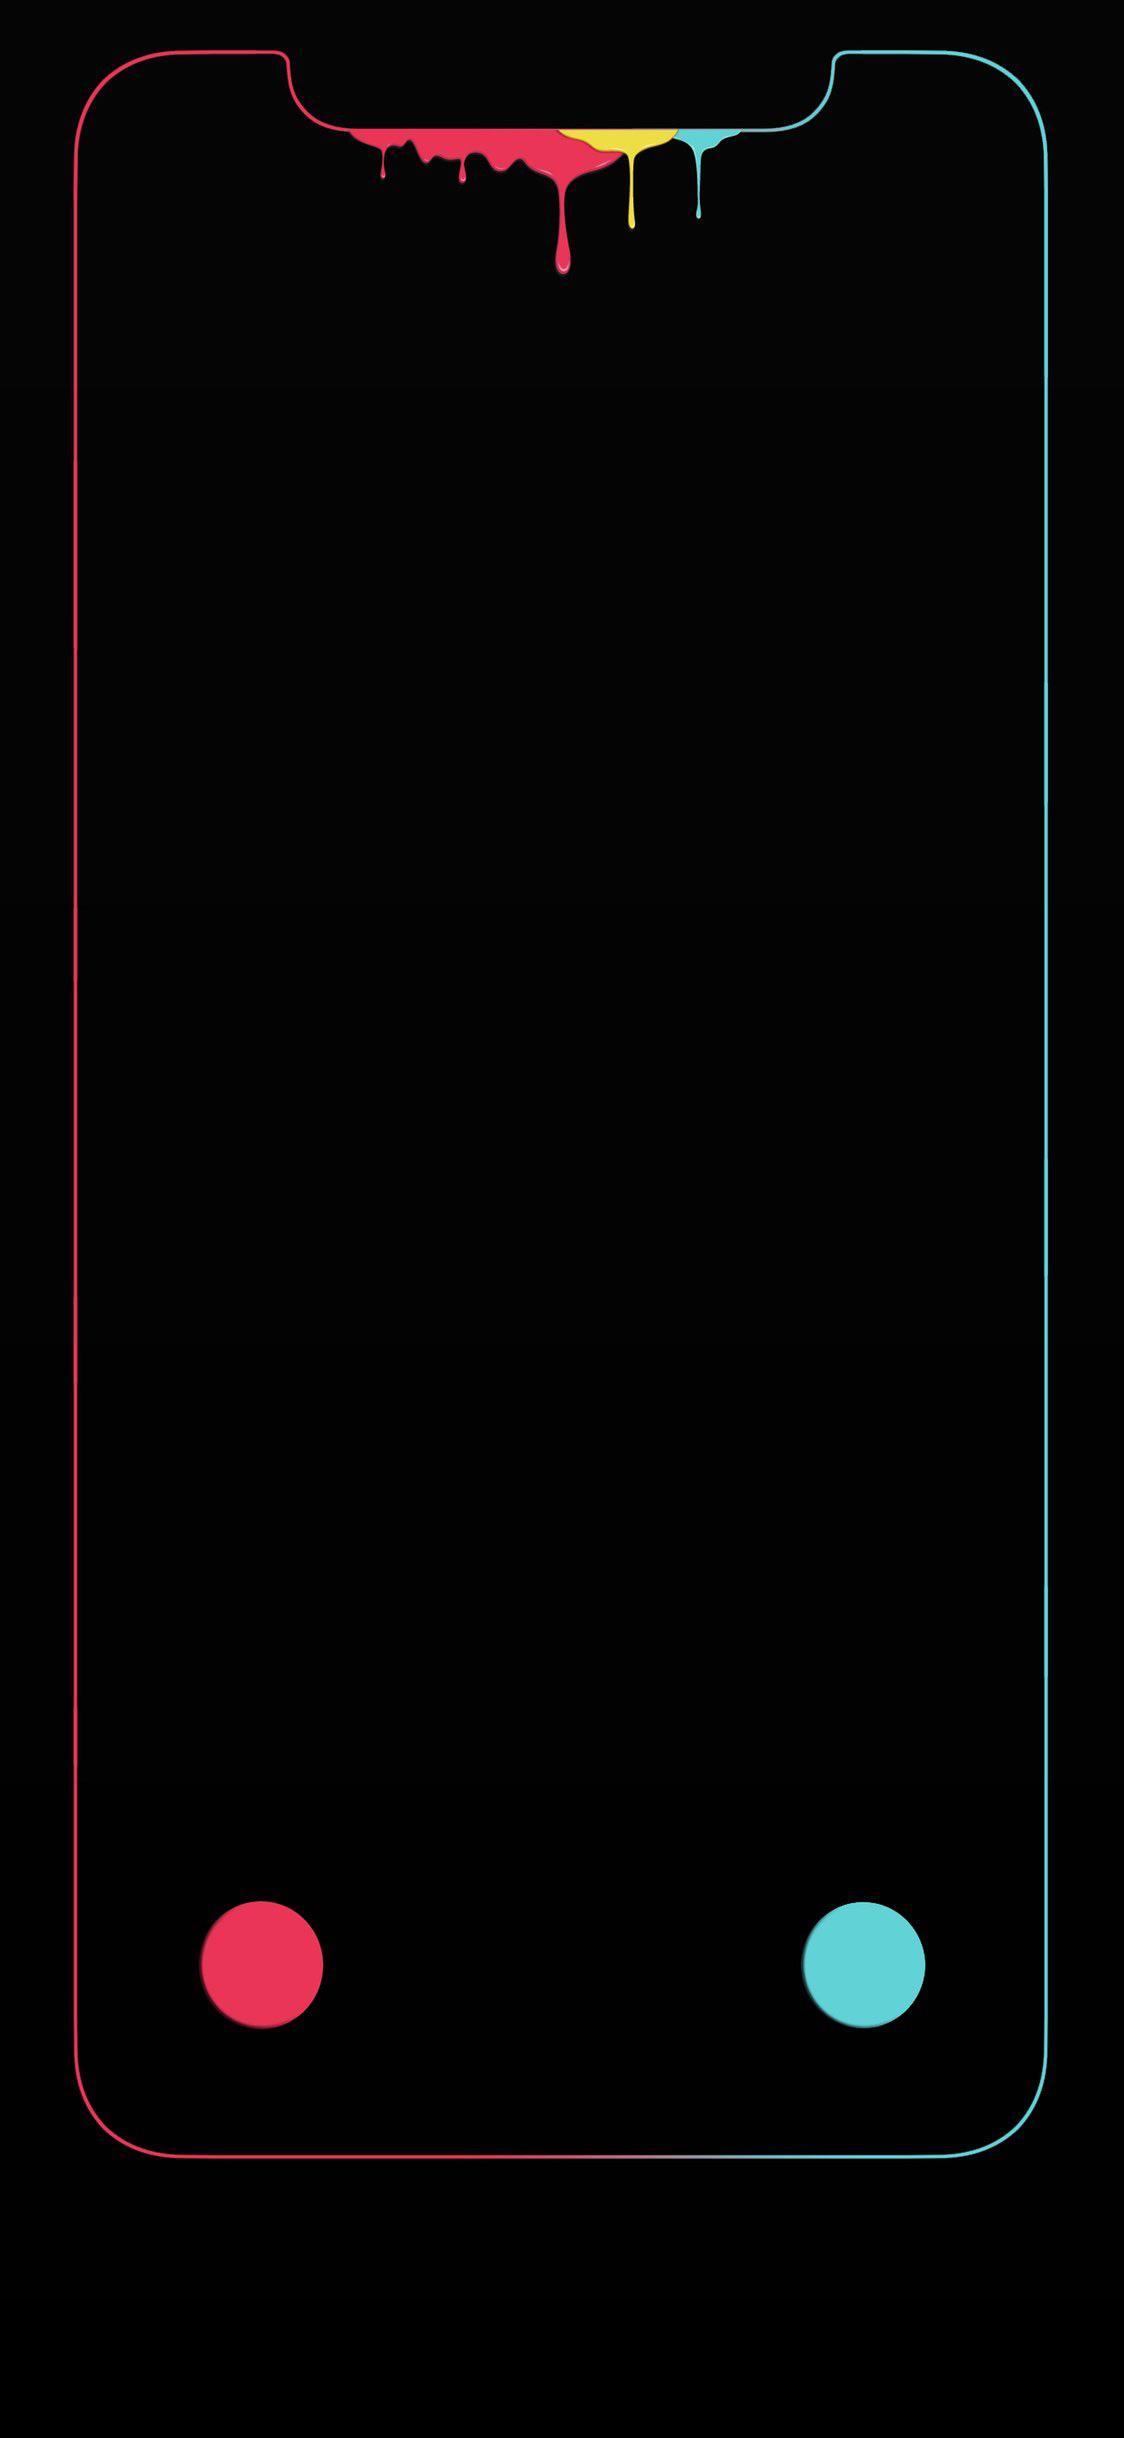 Coolest Wallpaper Iphone Xr